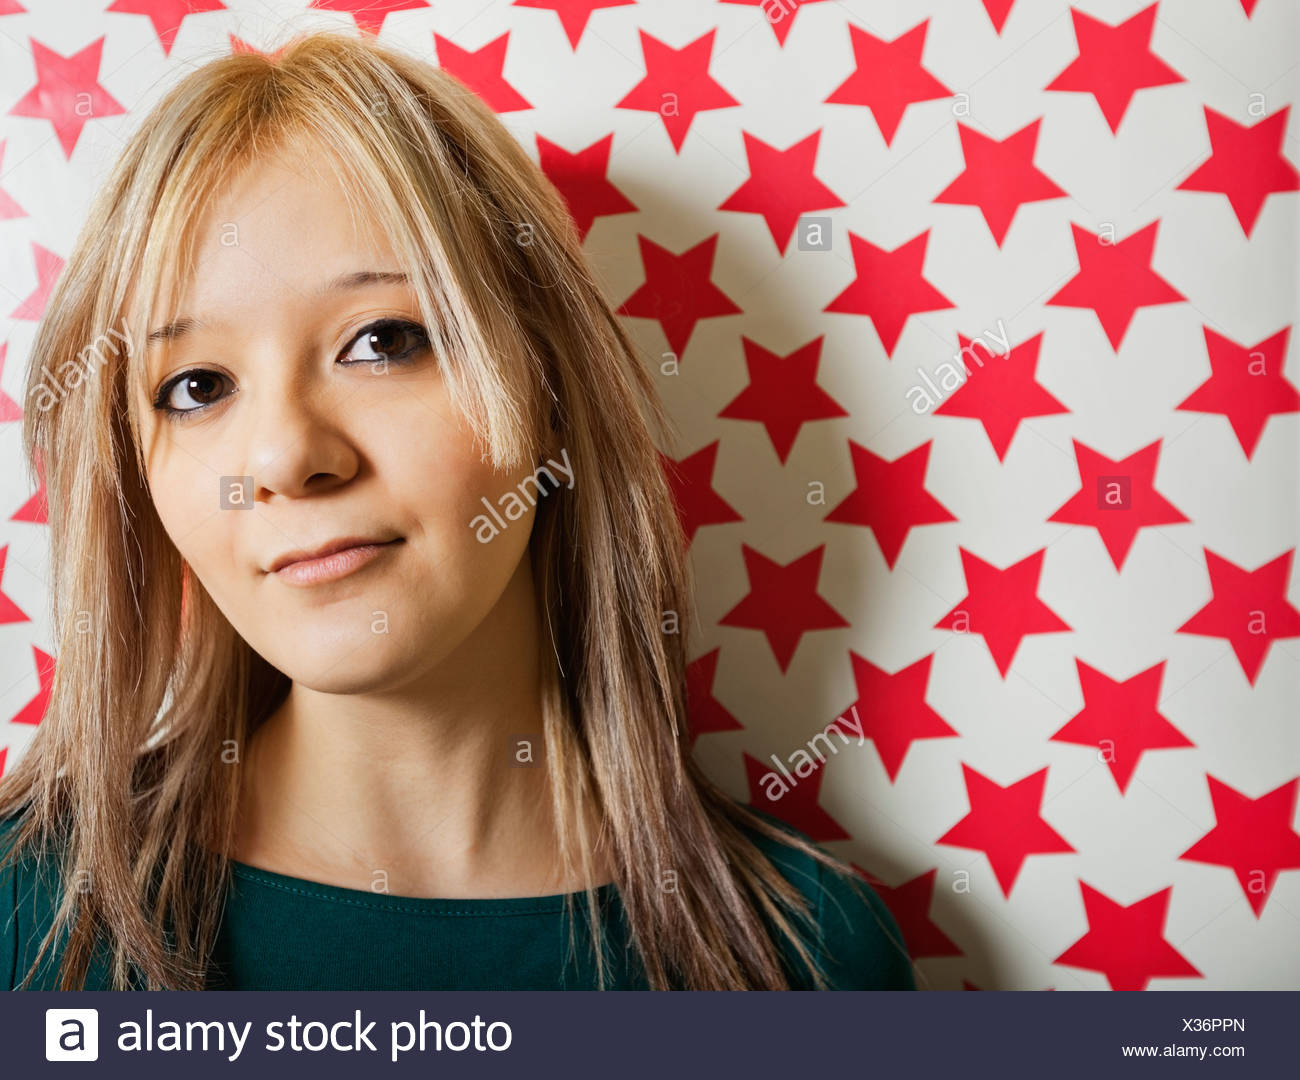 Cerca de la hermosa joven gainst formas de estrella roja papel tapiz Foto de stock